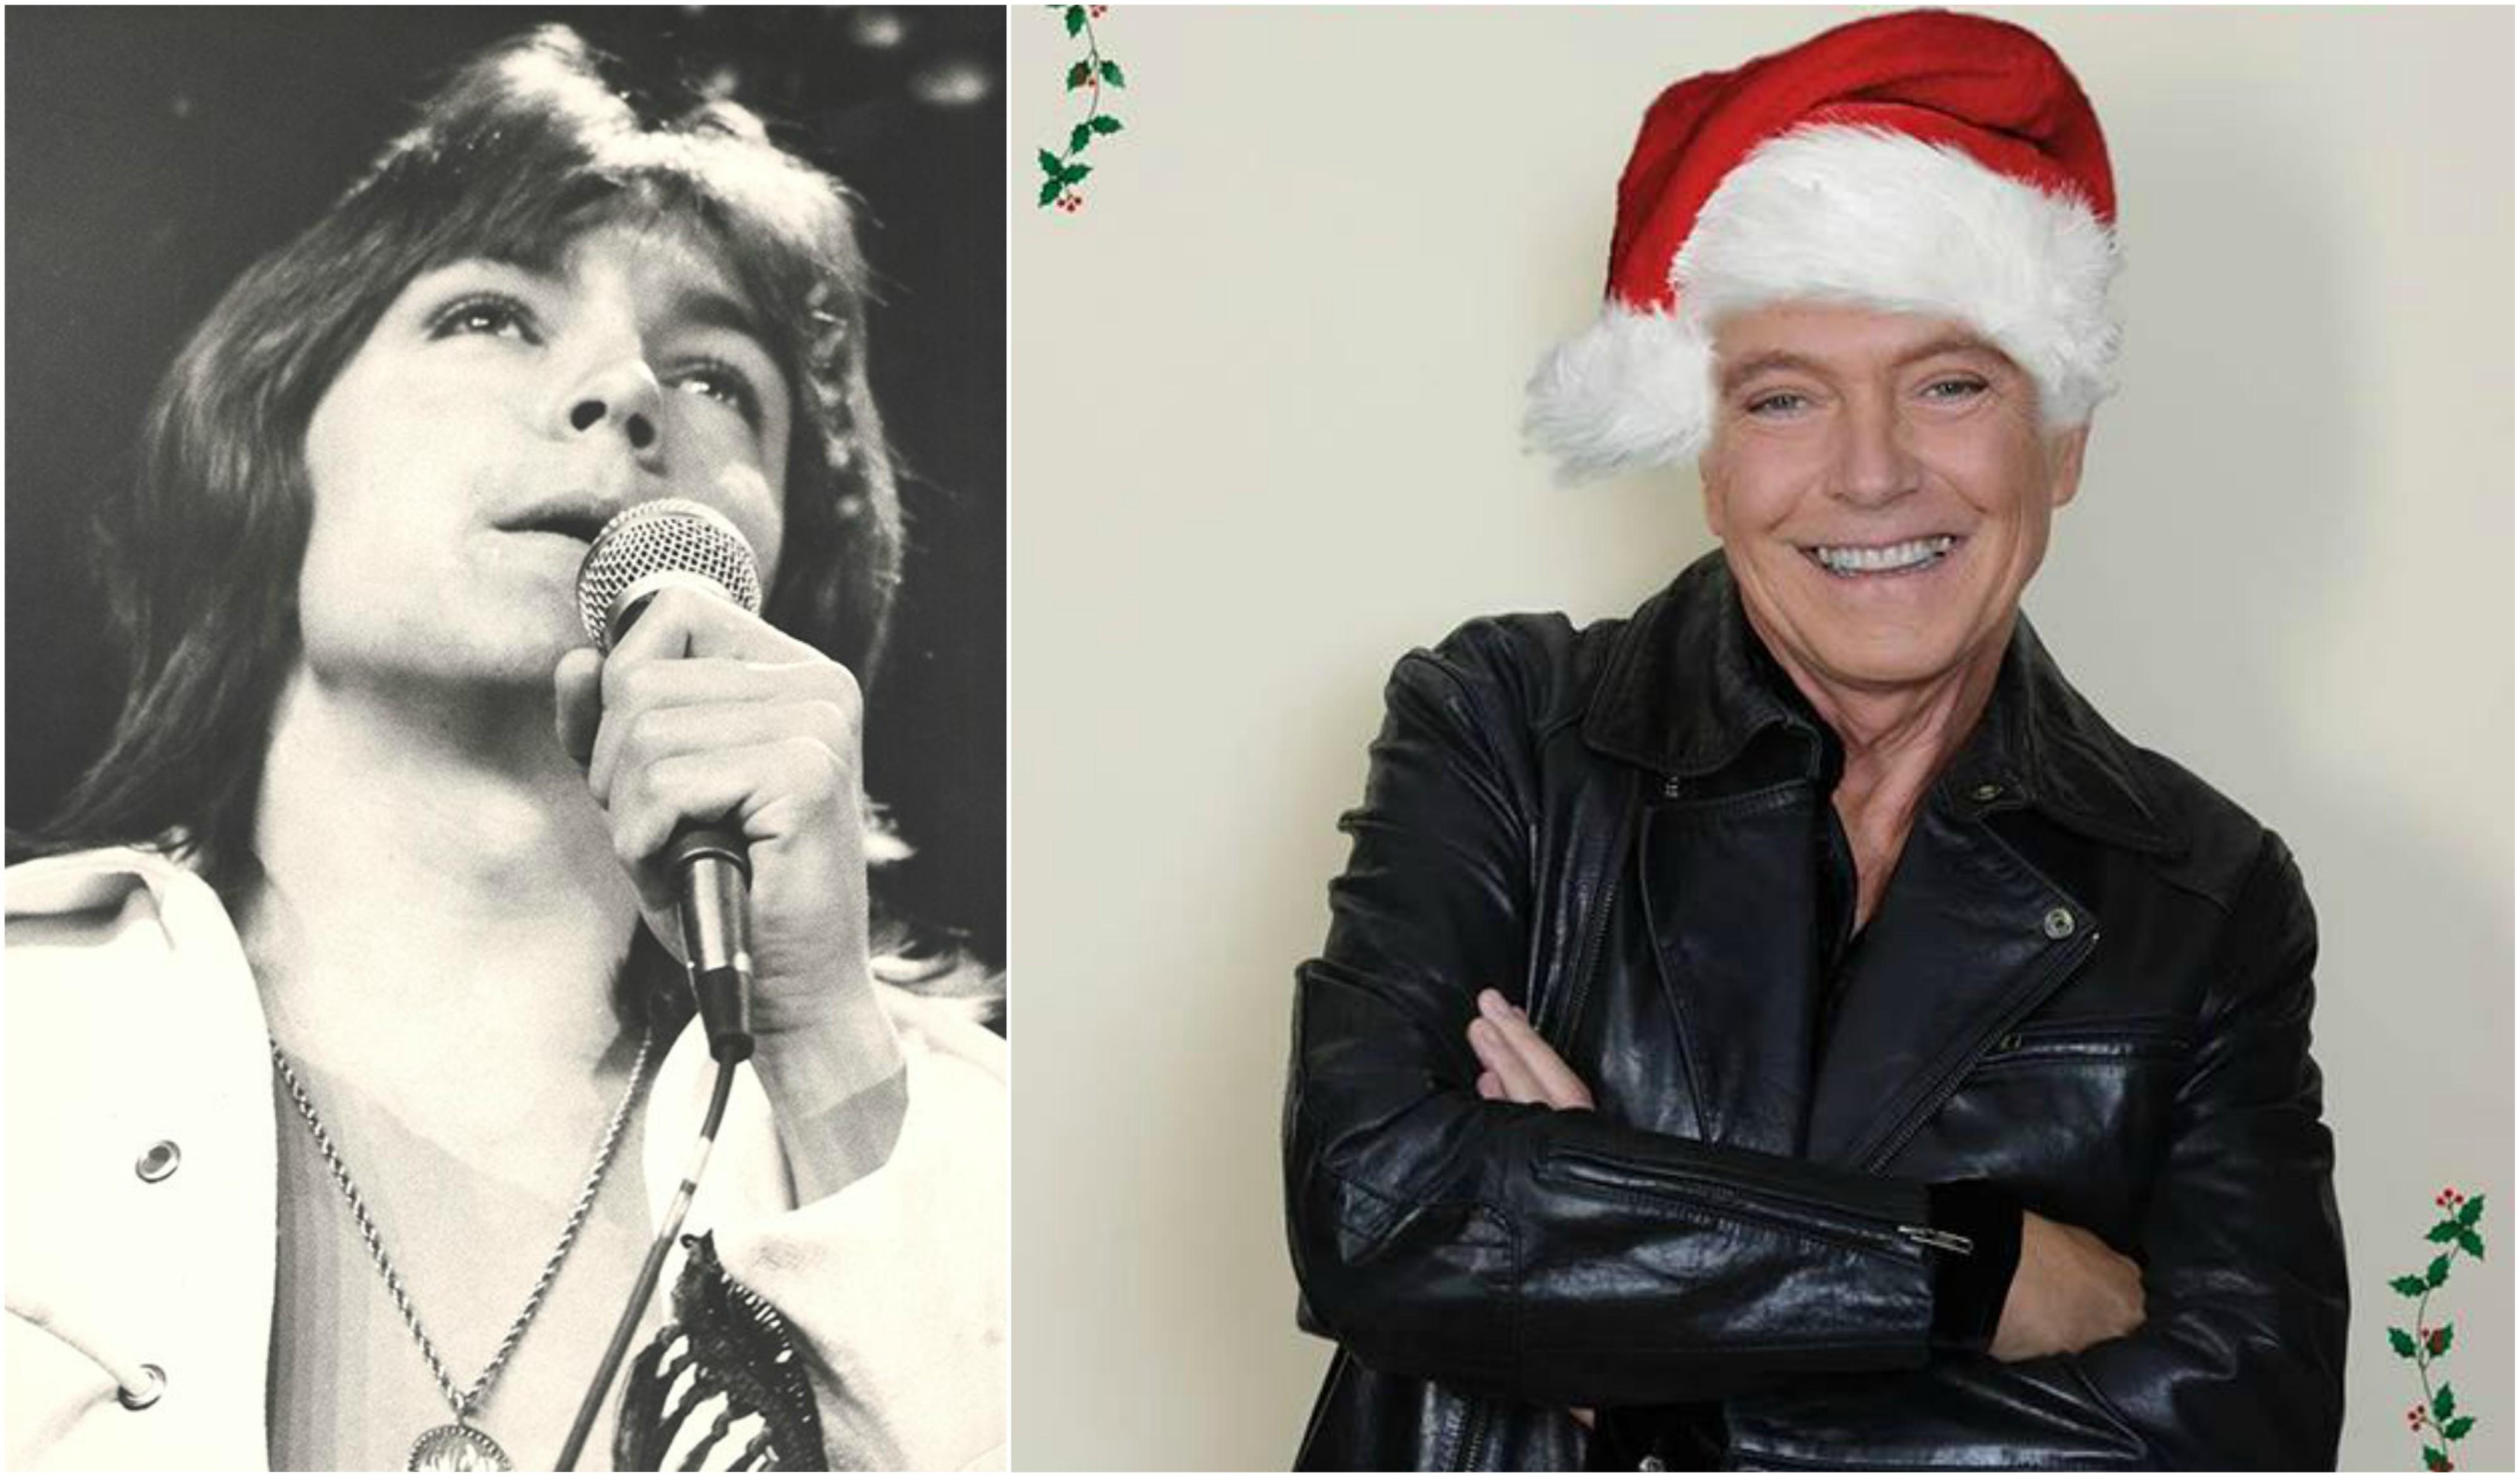 Ator e cantor David Cassidy morre aos 67 anos